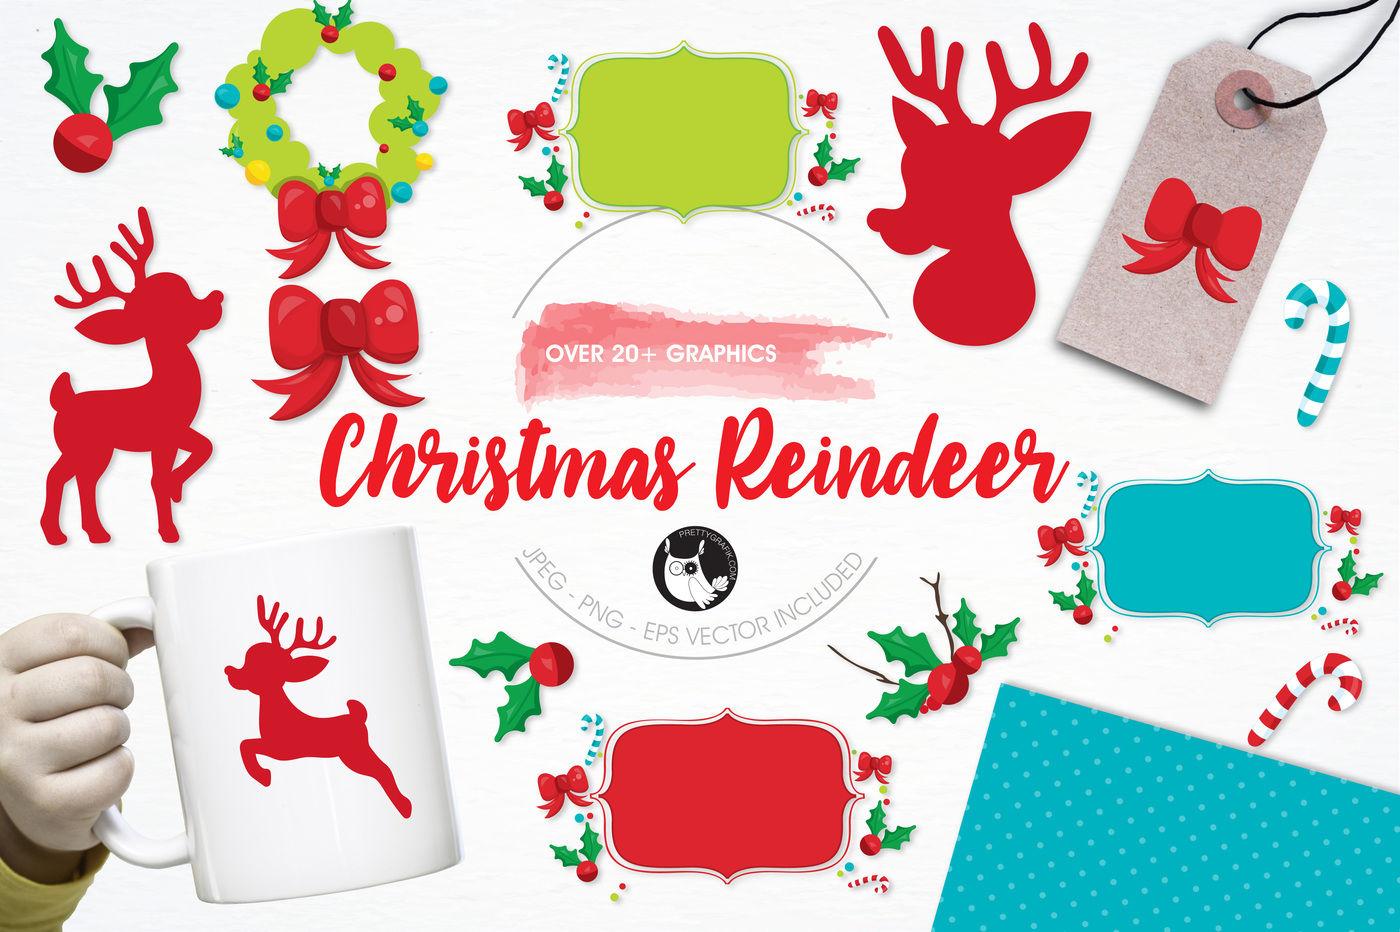 Christmas Reindeer Graphics And Illustrations By Prettygrafik